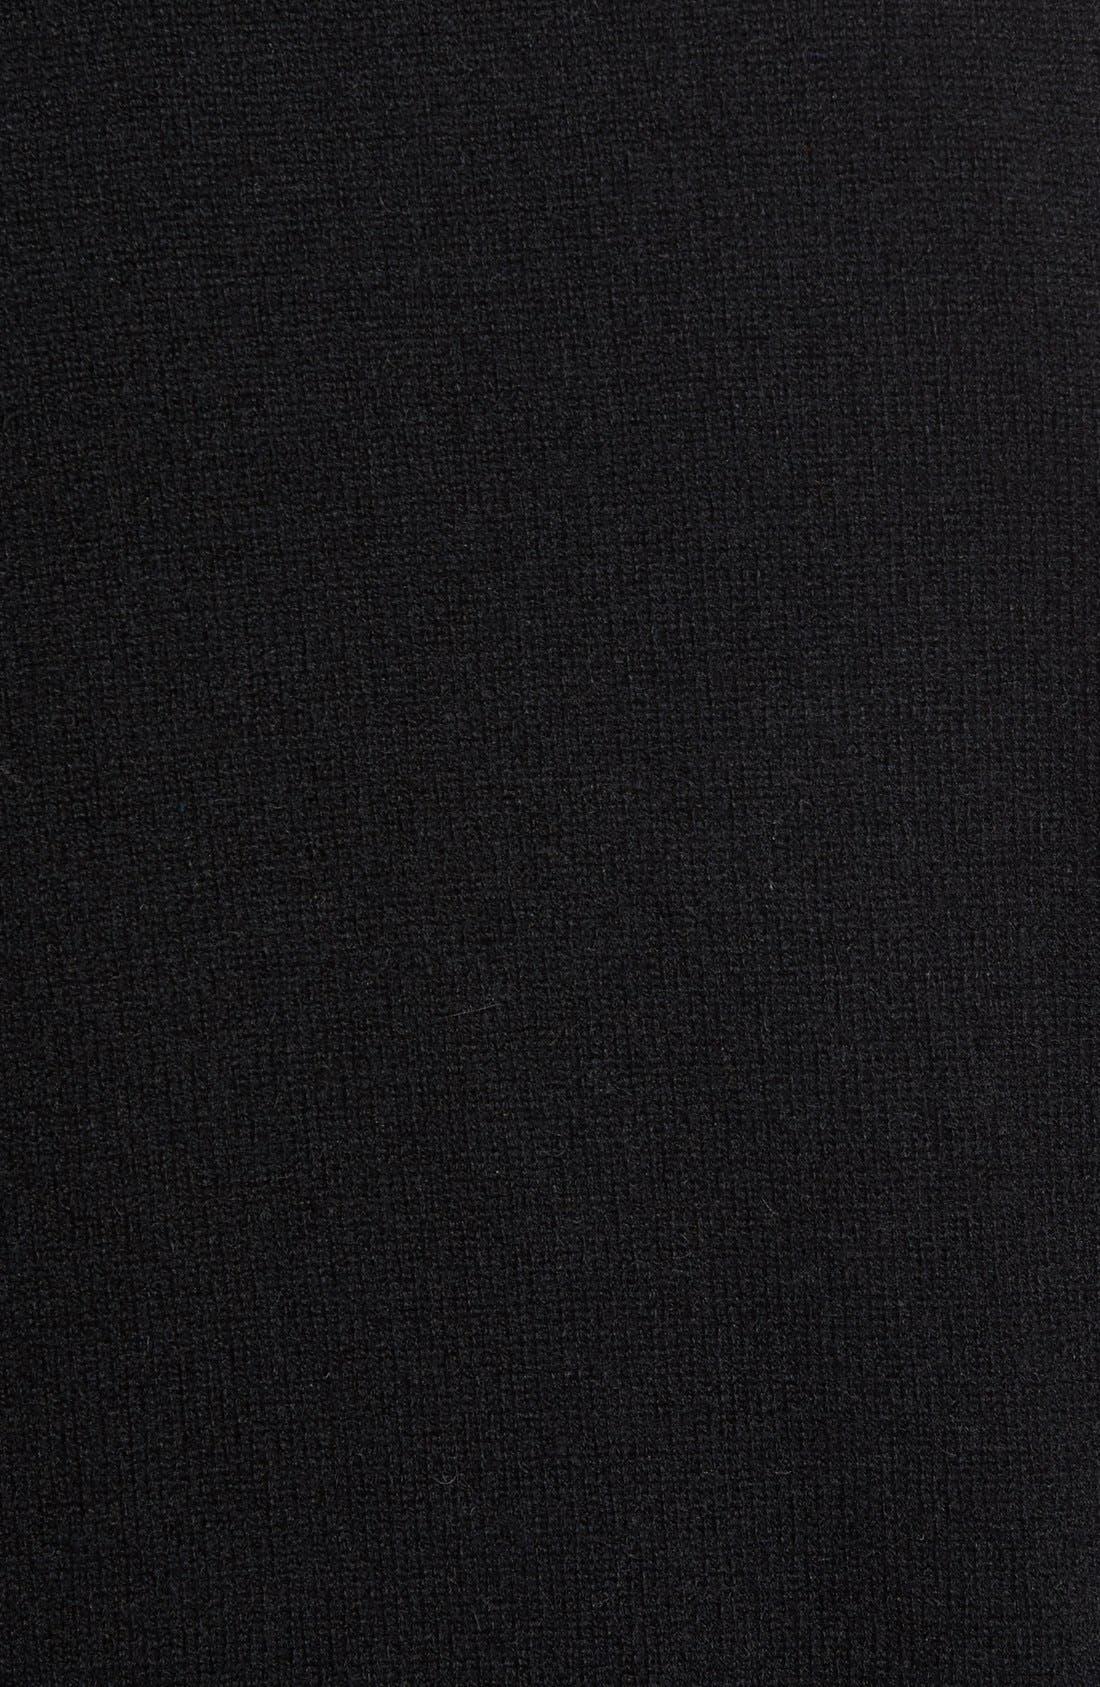 Cashmere V-Neck Sweater Vest,                             Alternate thumbnail 8, color,                             BLACK CAVIAR